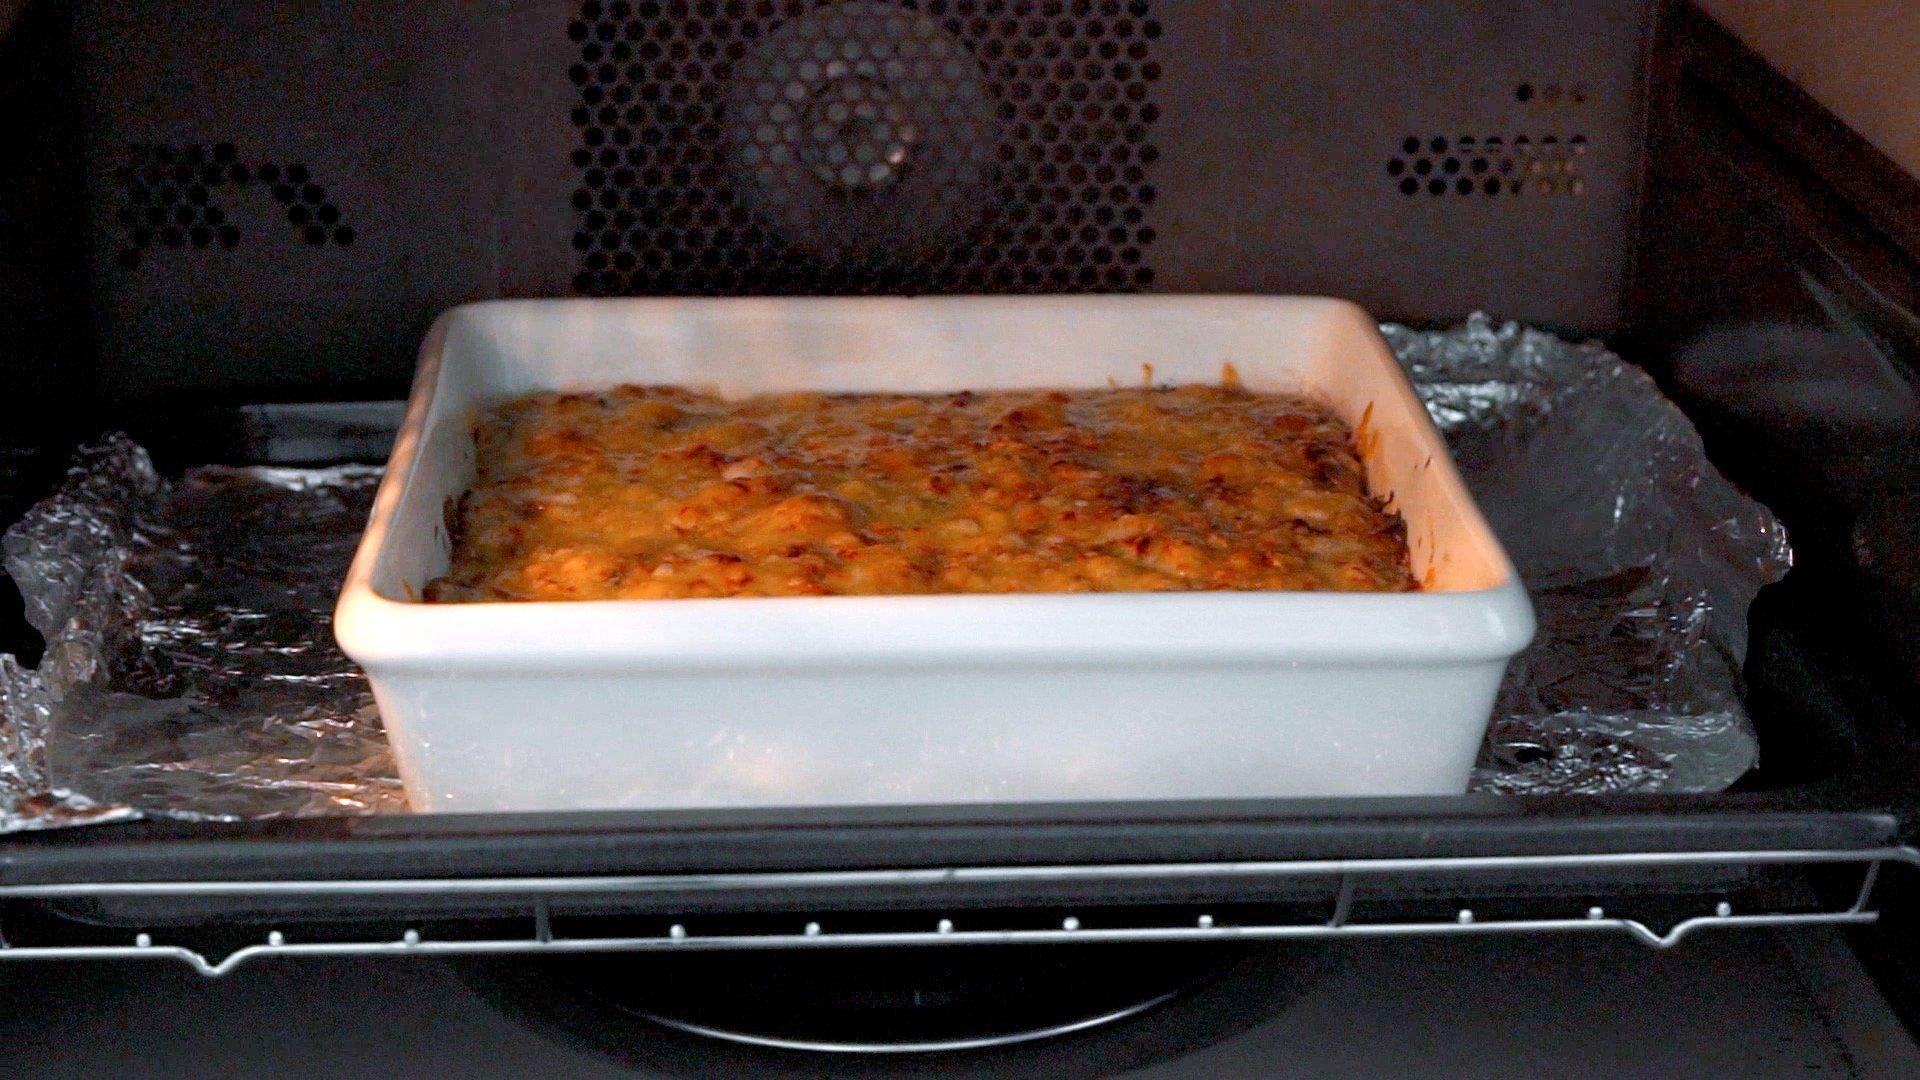 Doria baking in the oven.